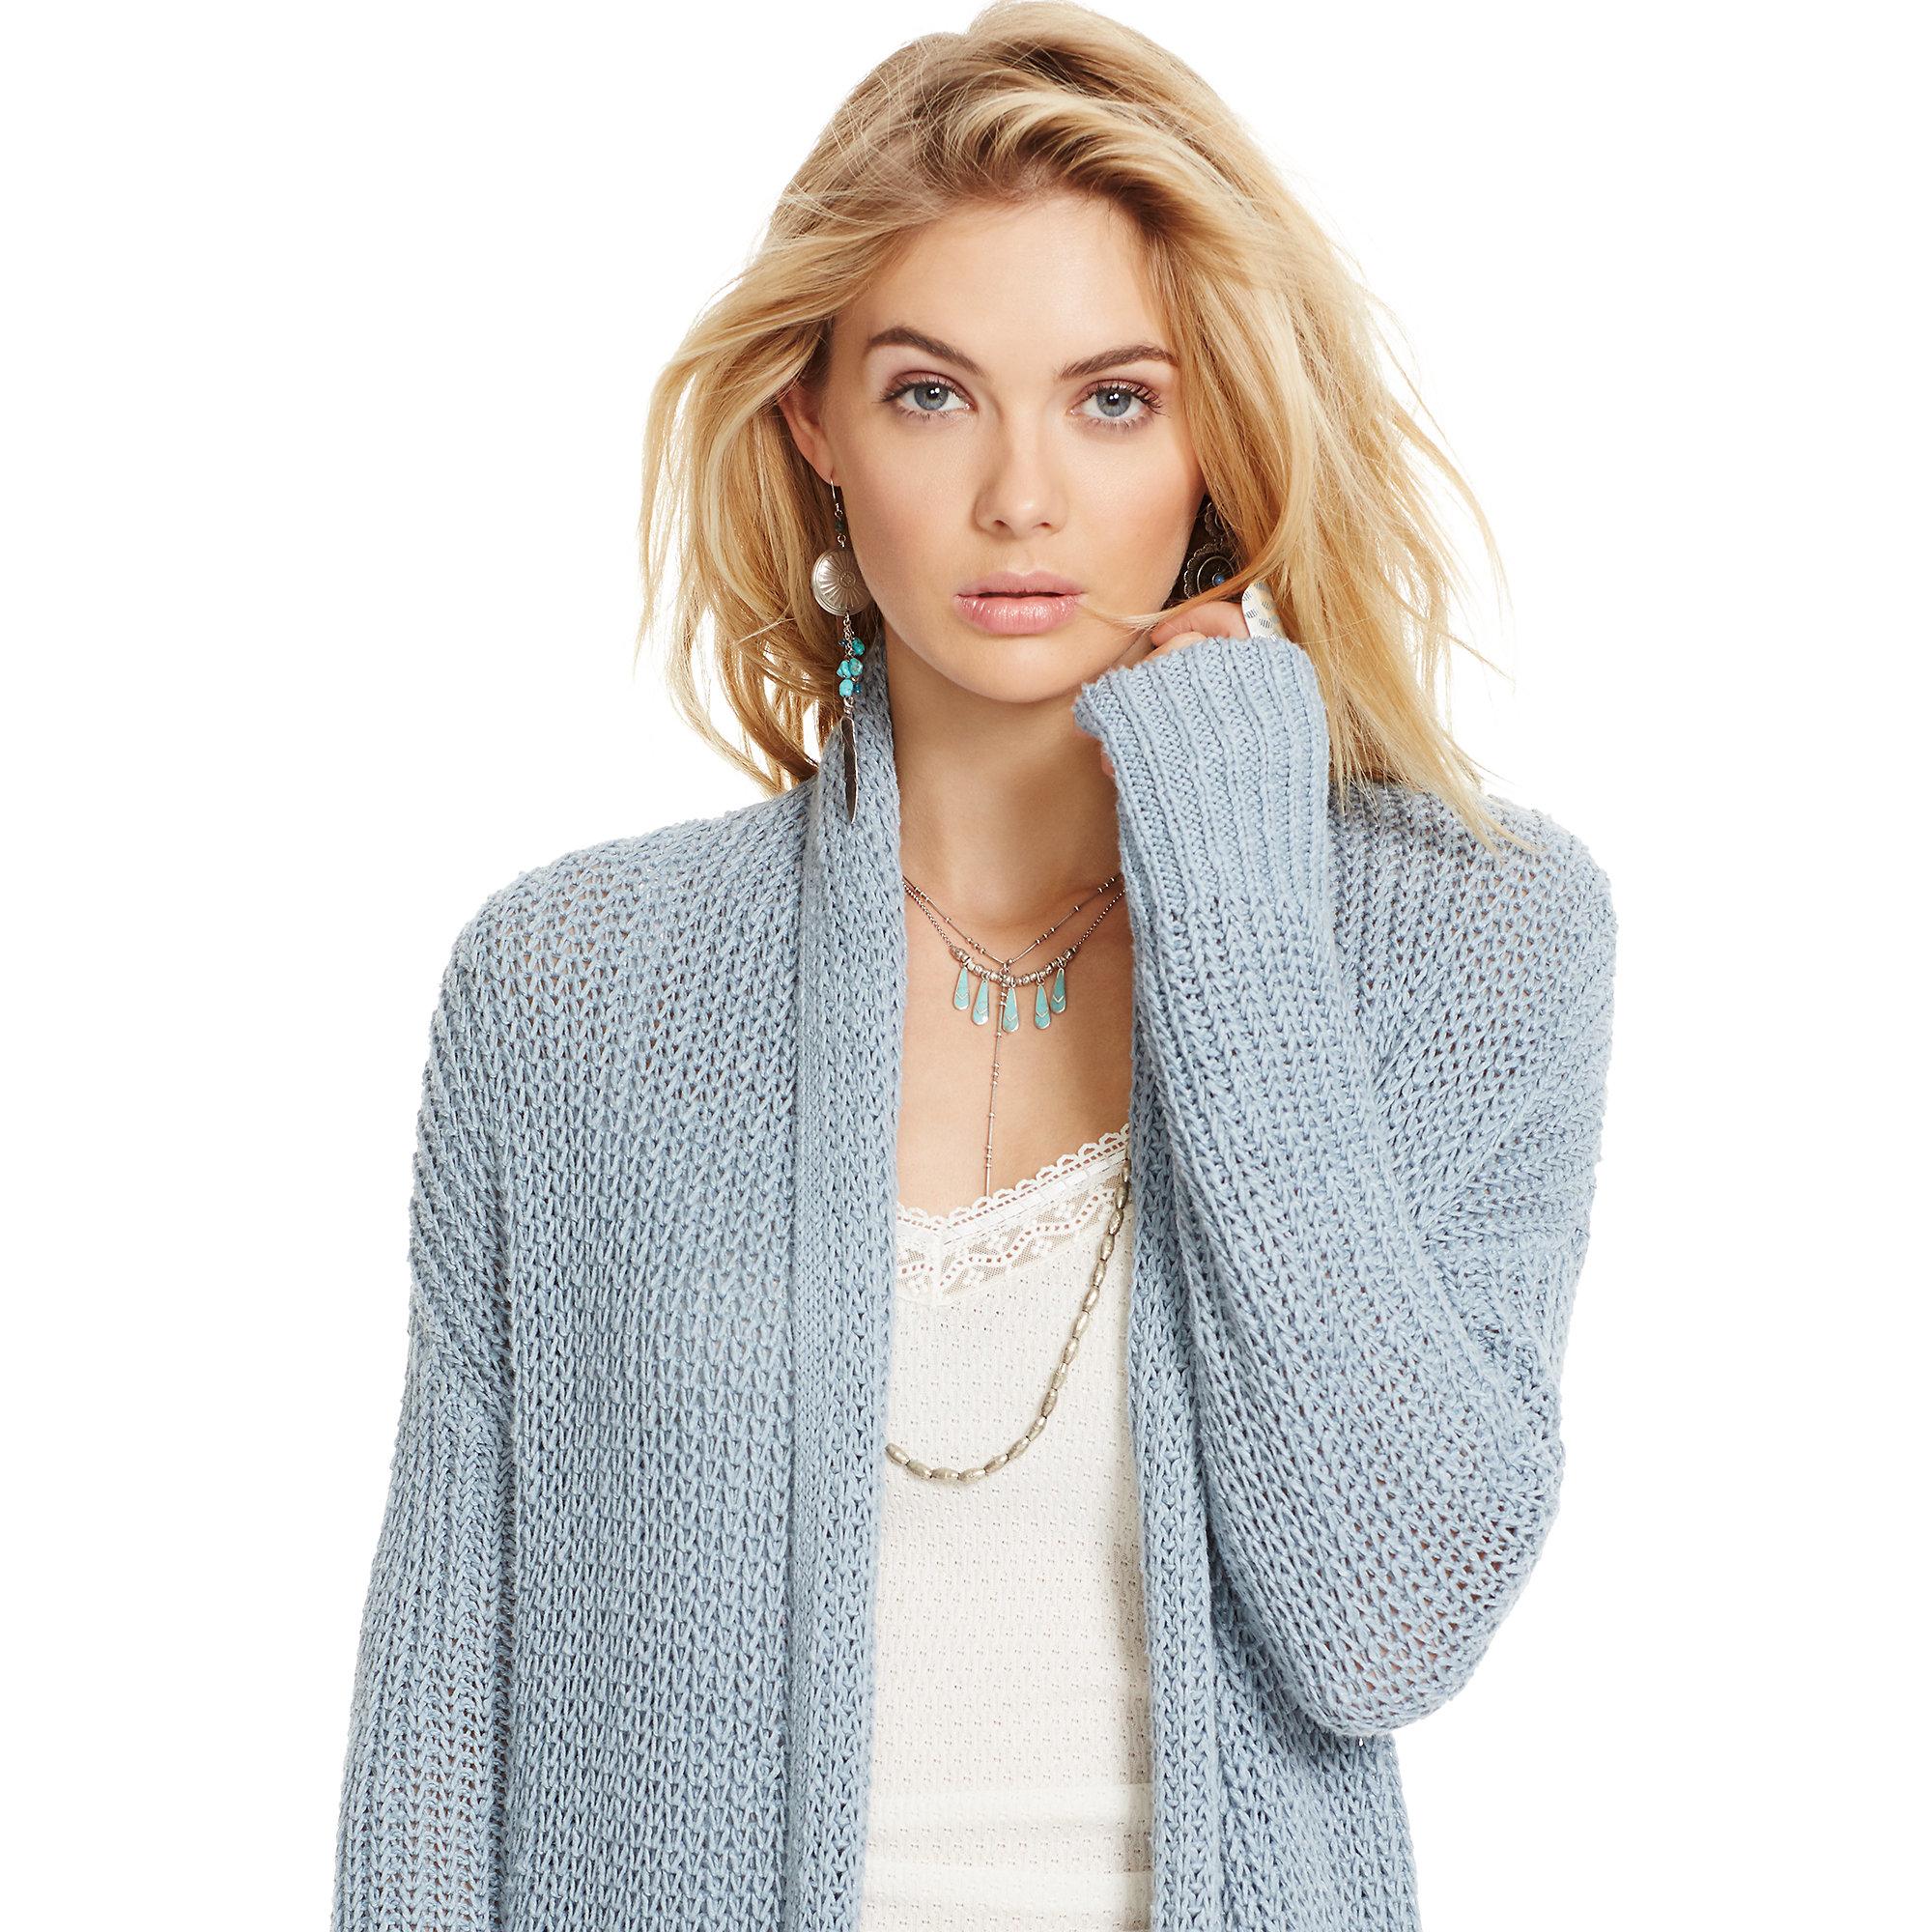 Lyst - Denim   Supply Ralph Lauren Cotton-linen Shawl Cardigan in Blue 2e423ad1e